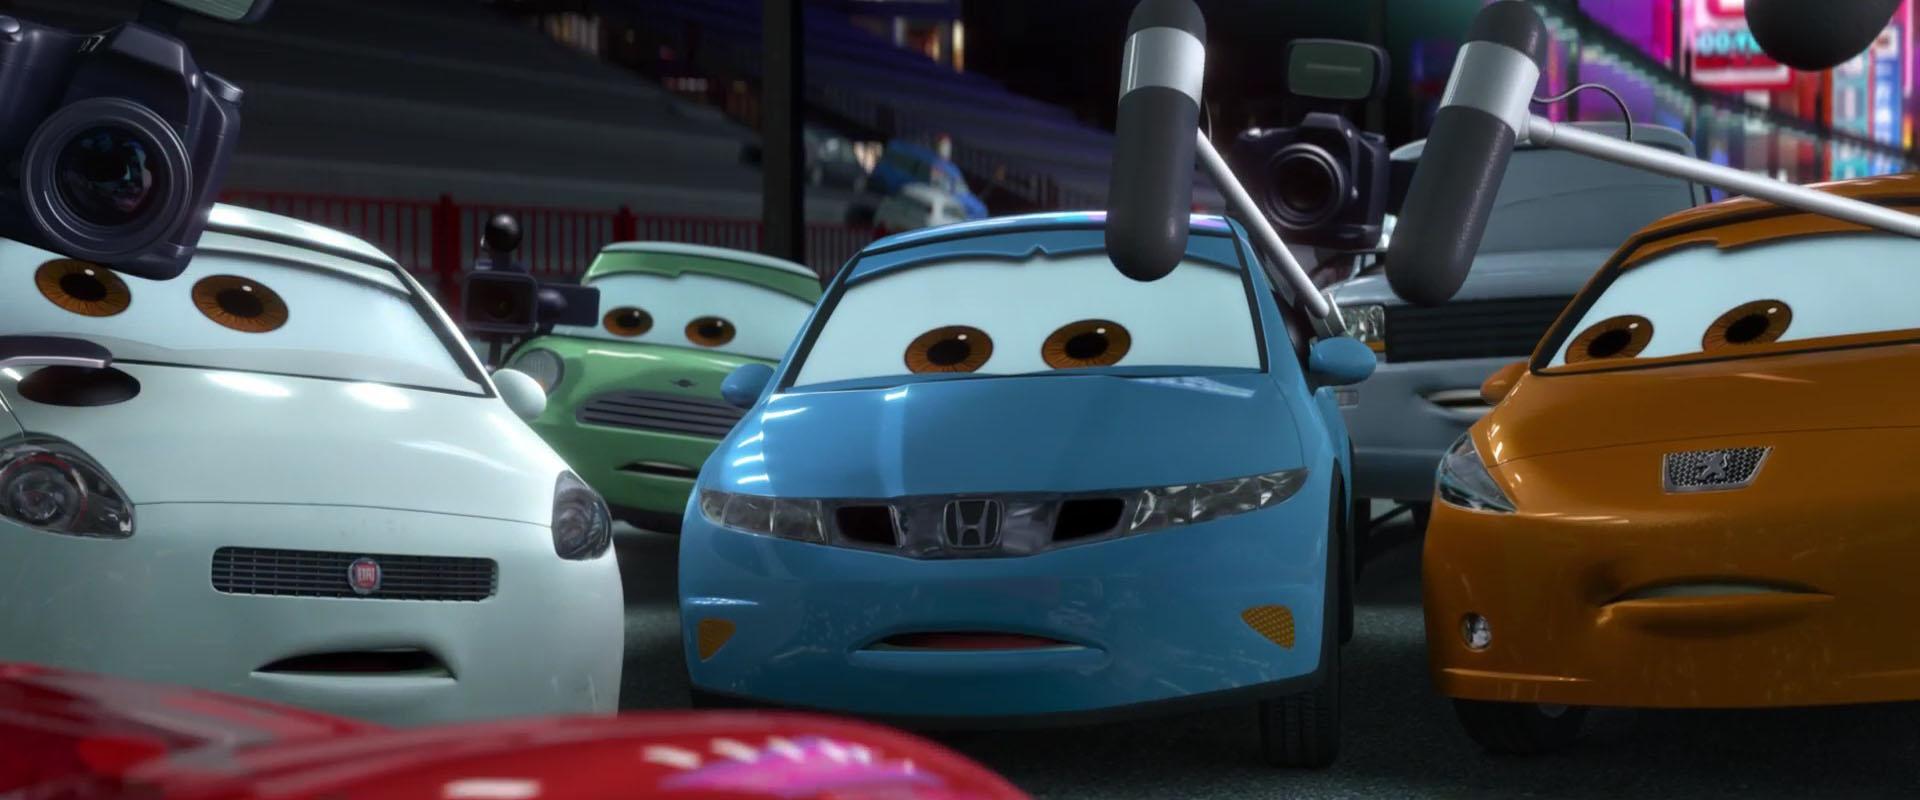 nick cartone personnage character pixar disney cars 2